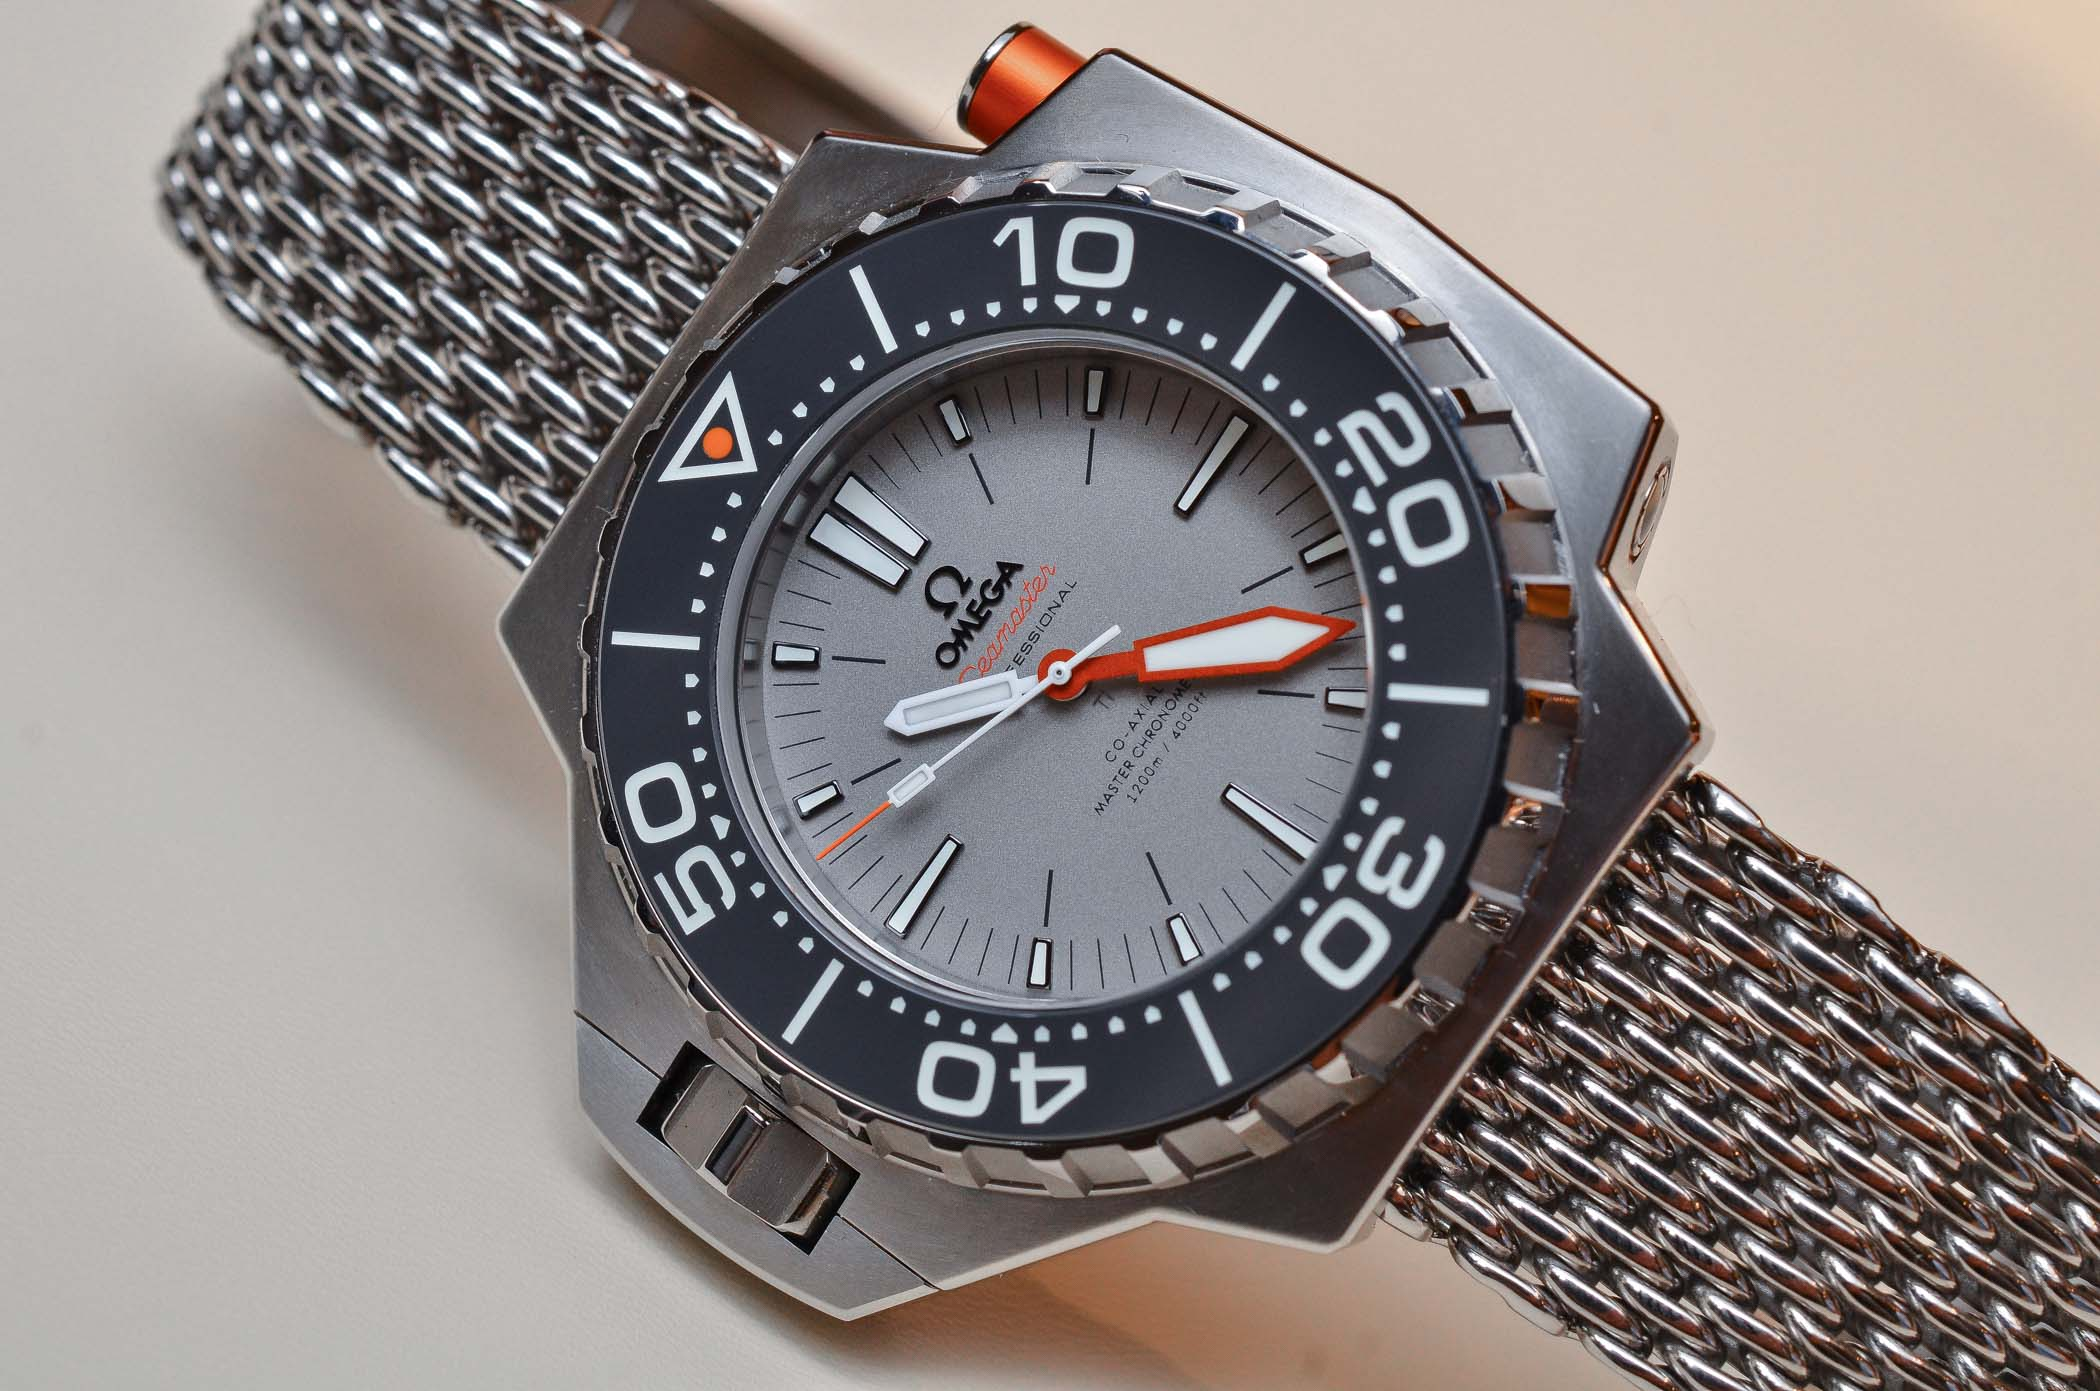 Omega Seamaster Ploprof 1200 Master Coaxial Titanium